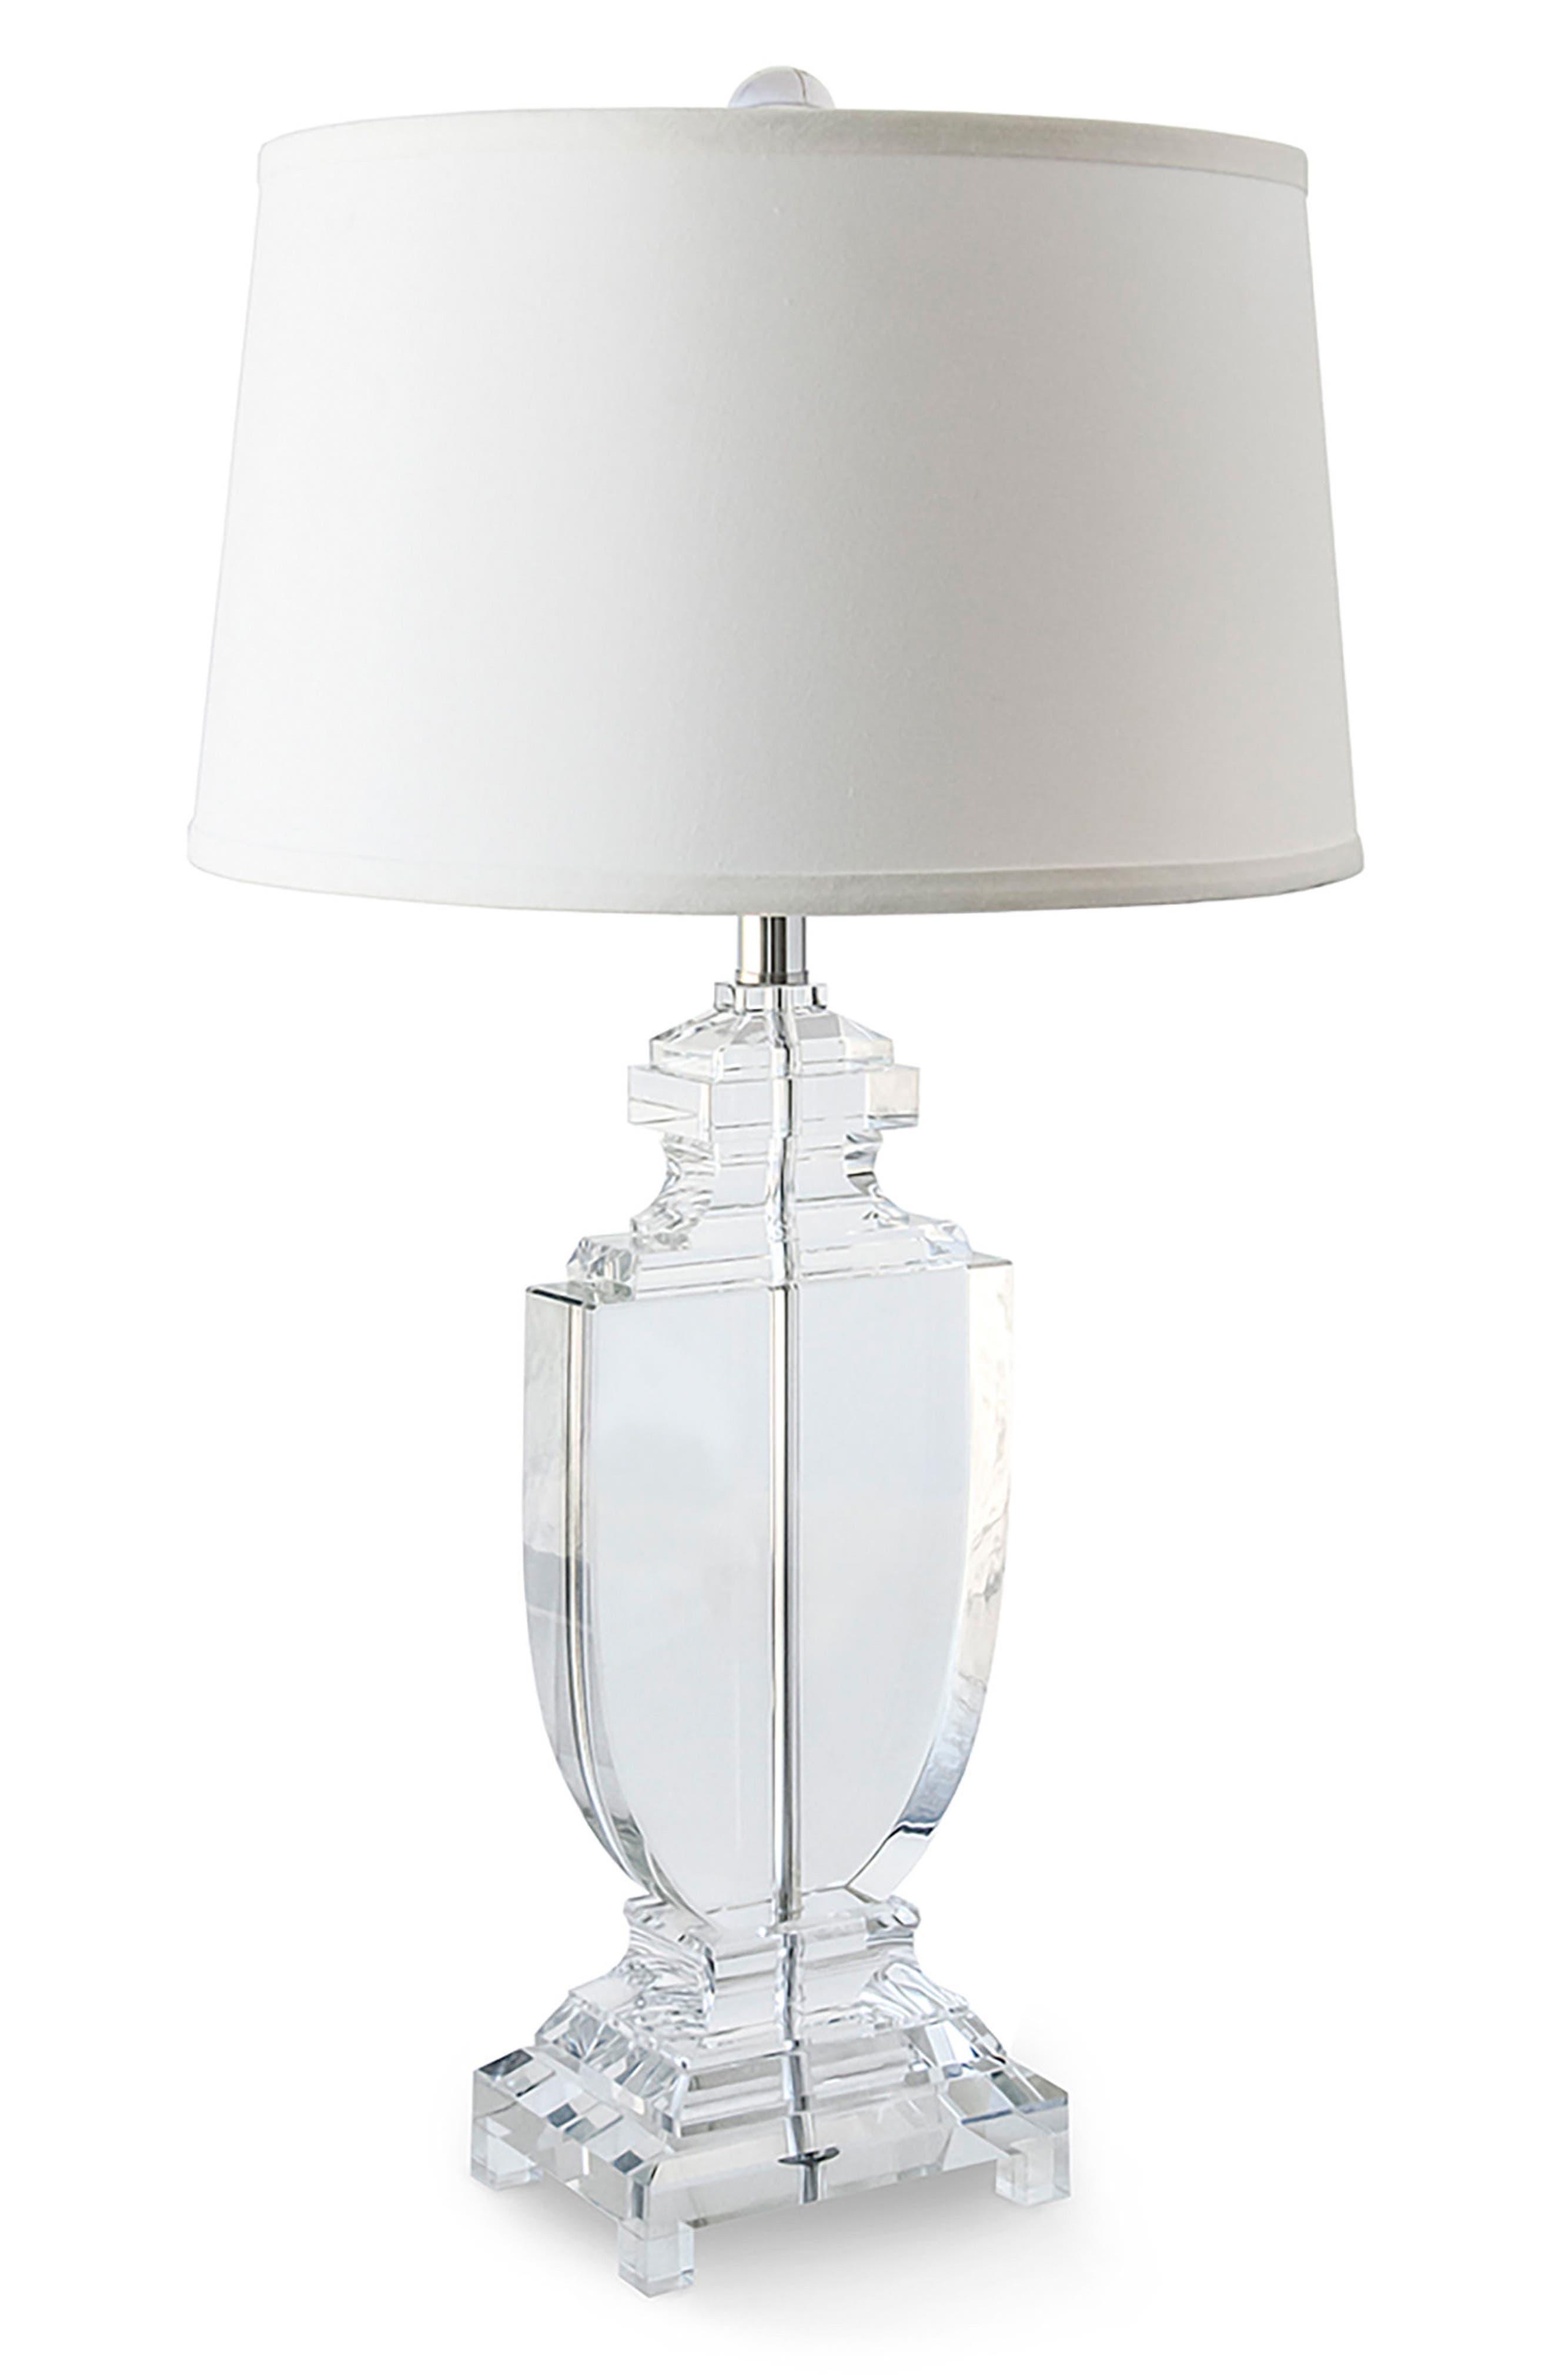 Urn Table Lamp,                             Main thumbnail 1, color,